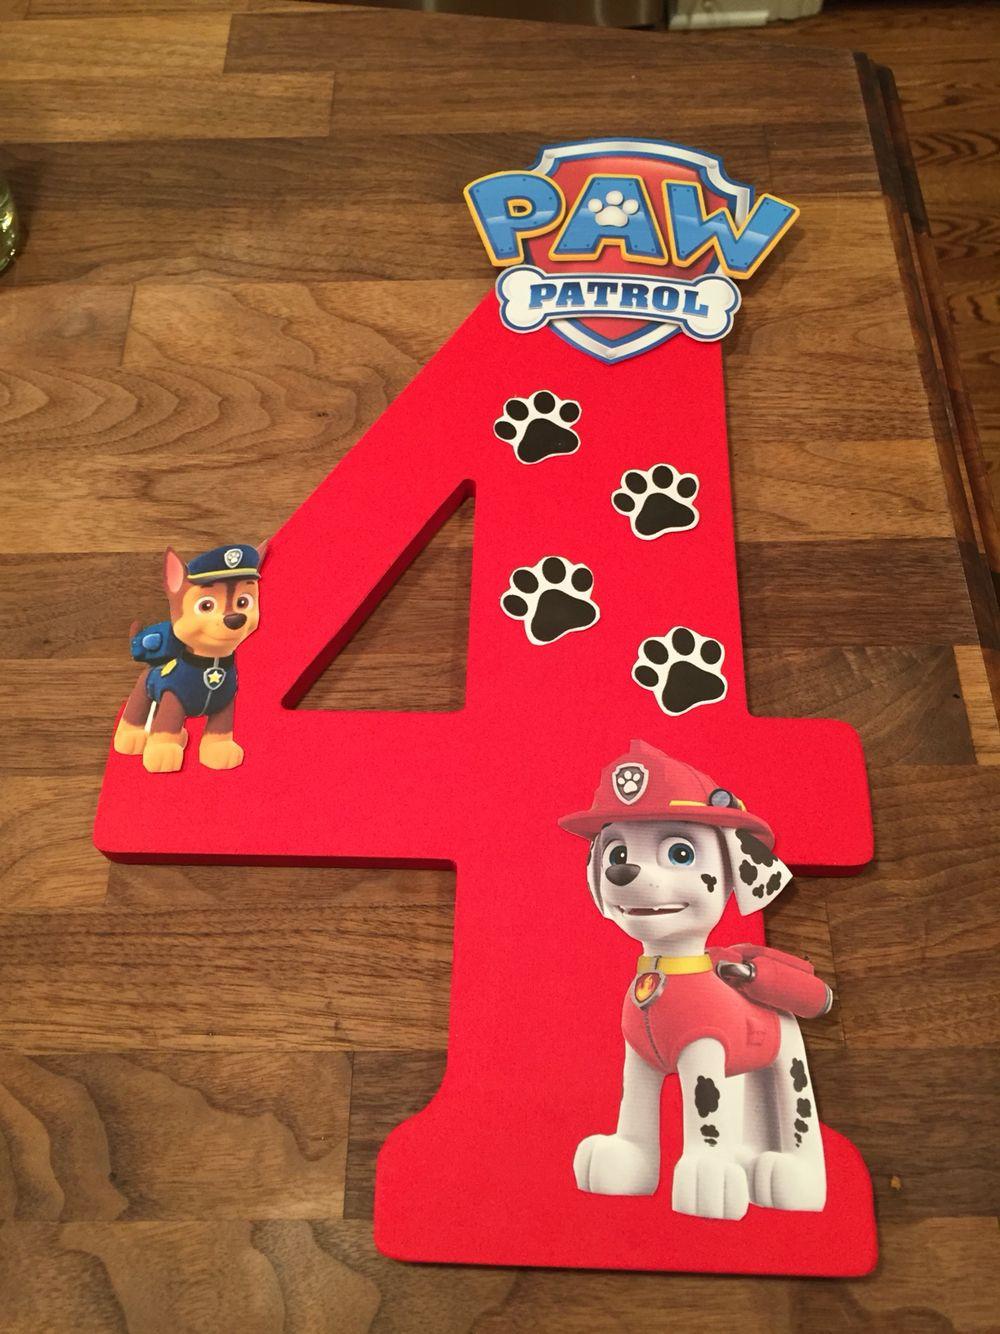 Best ideas about Paw Patrol Birthday Decor . Save or Pin DIY Paw Patrol Birthday Decoration What you need Now.